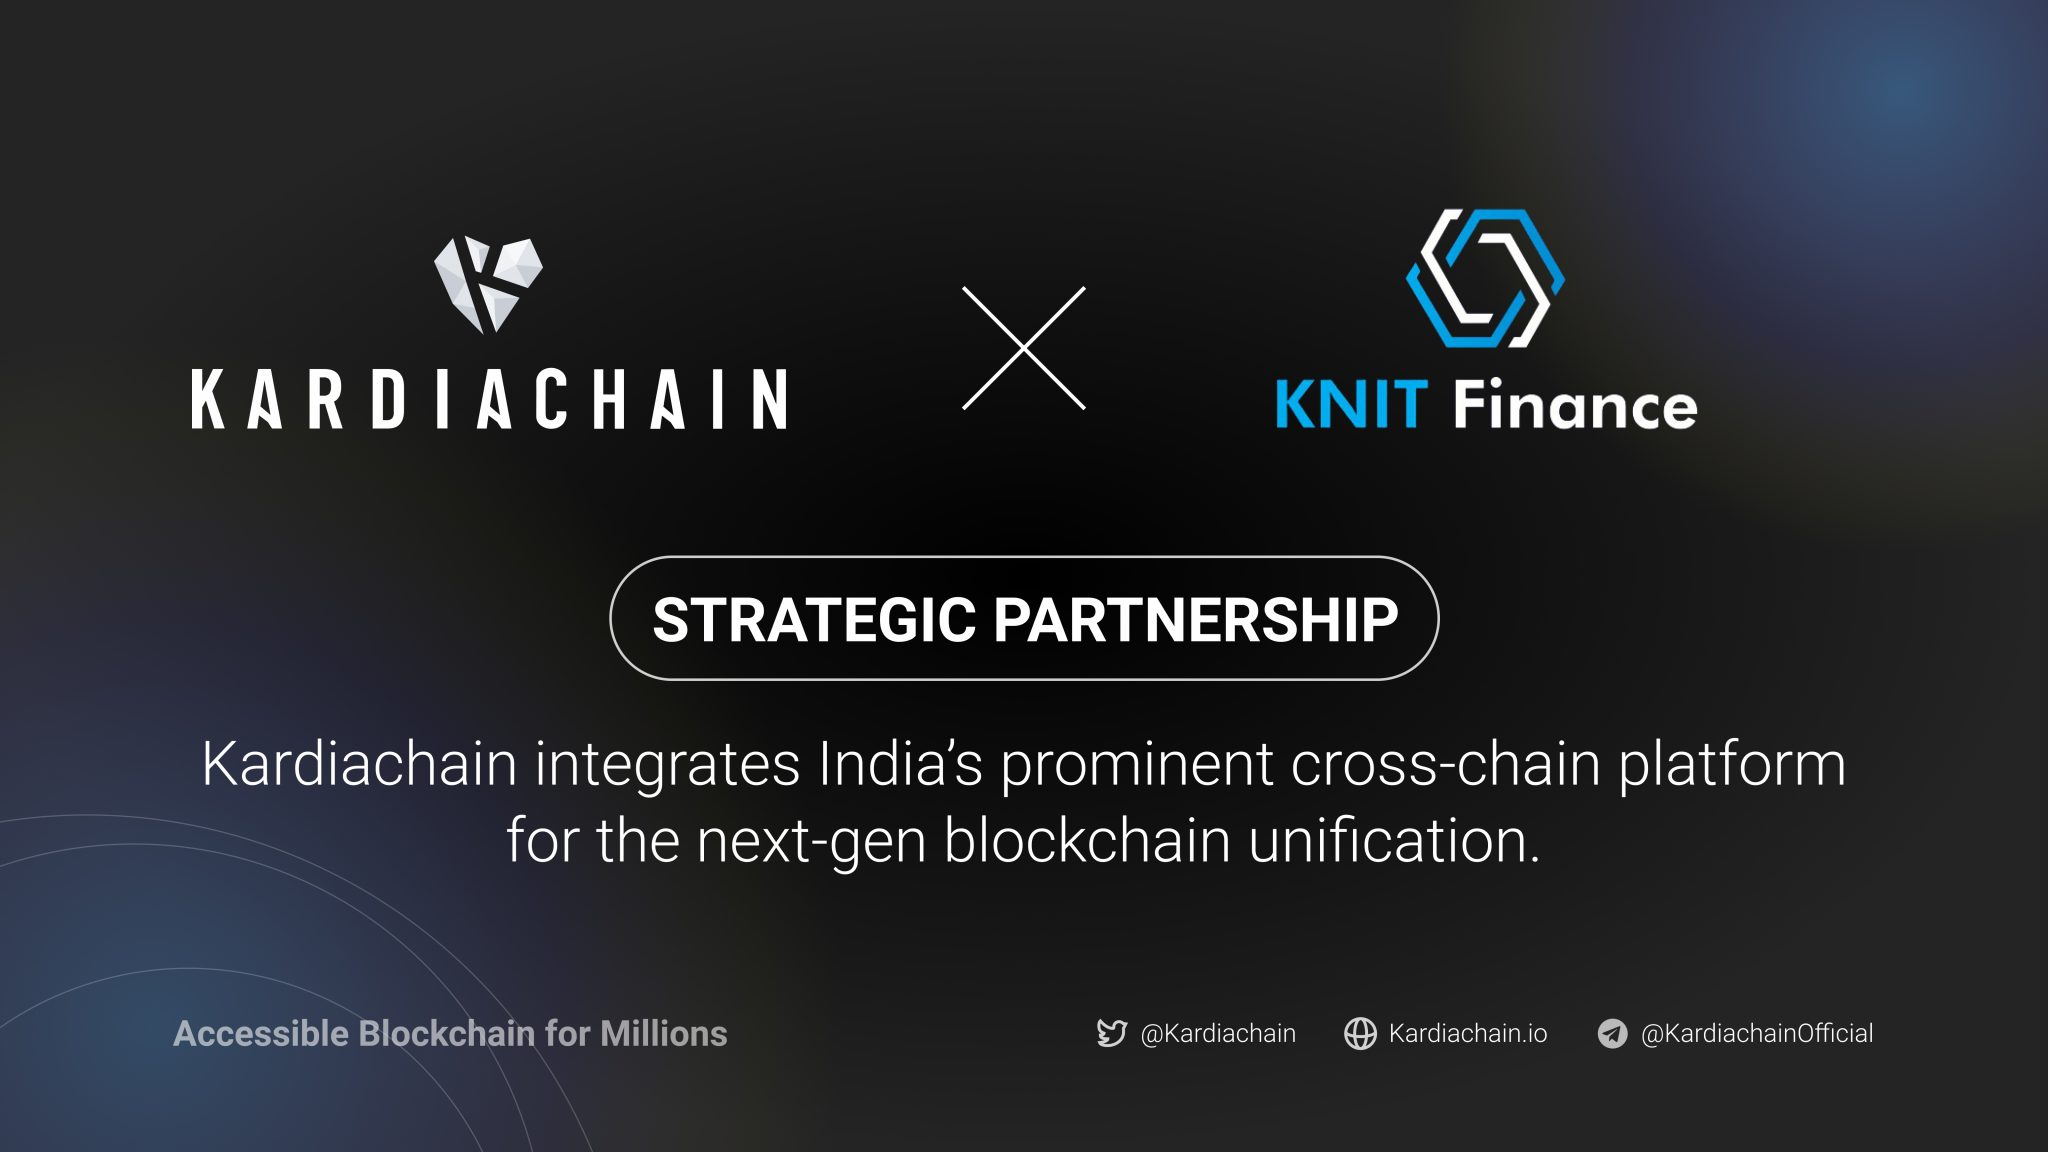 Kardiachain Enters Strategic Partnership With Knit Finance